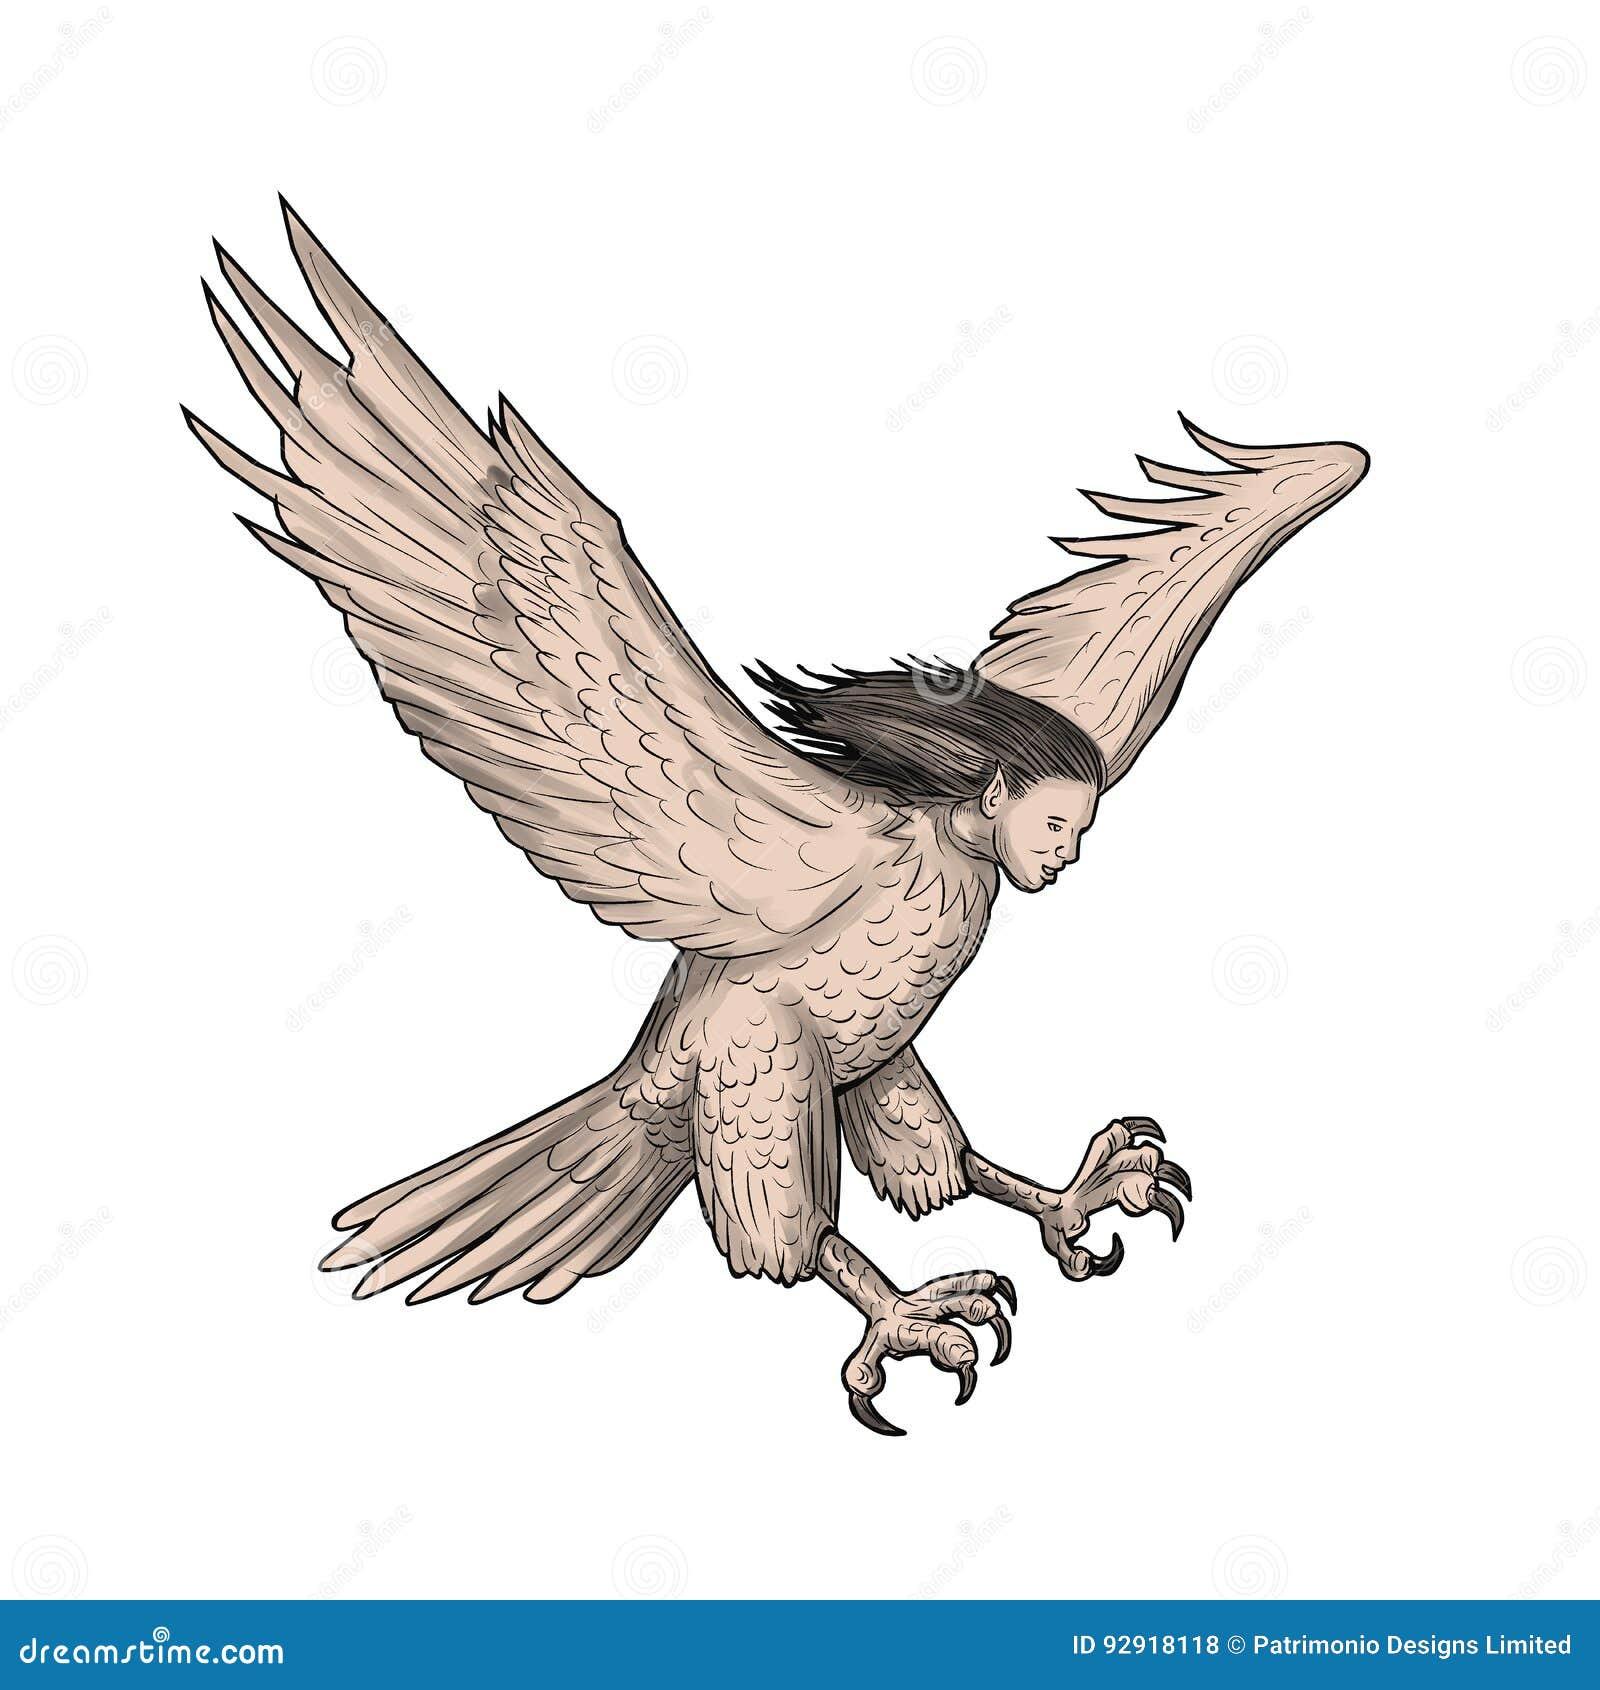 harpy swooping tattoo stock illustration image of harpy 92918118. Black Bedroom Furniture Sets. Home Design Ideas